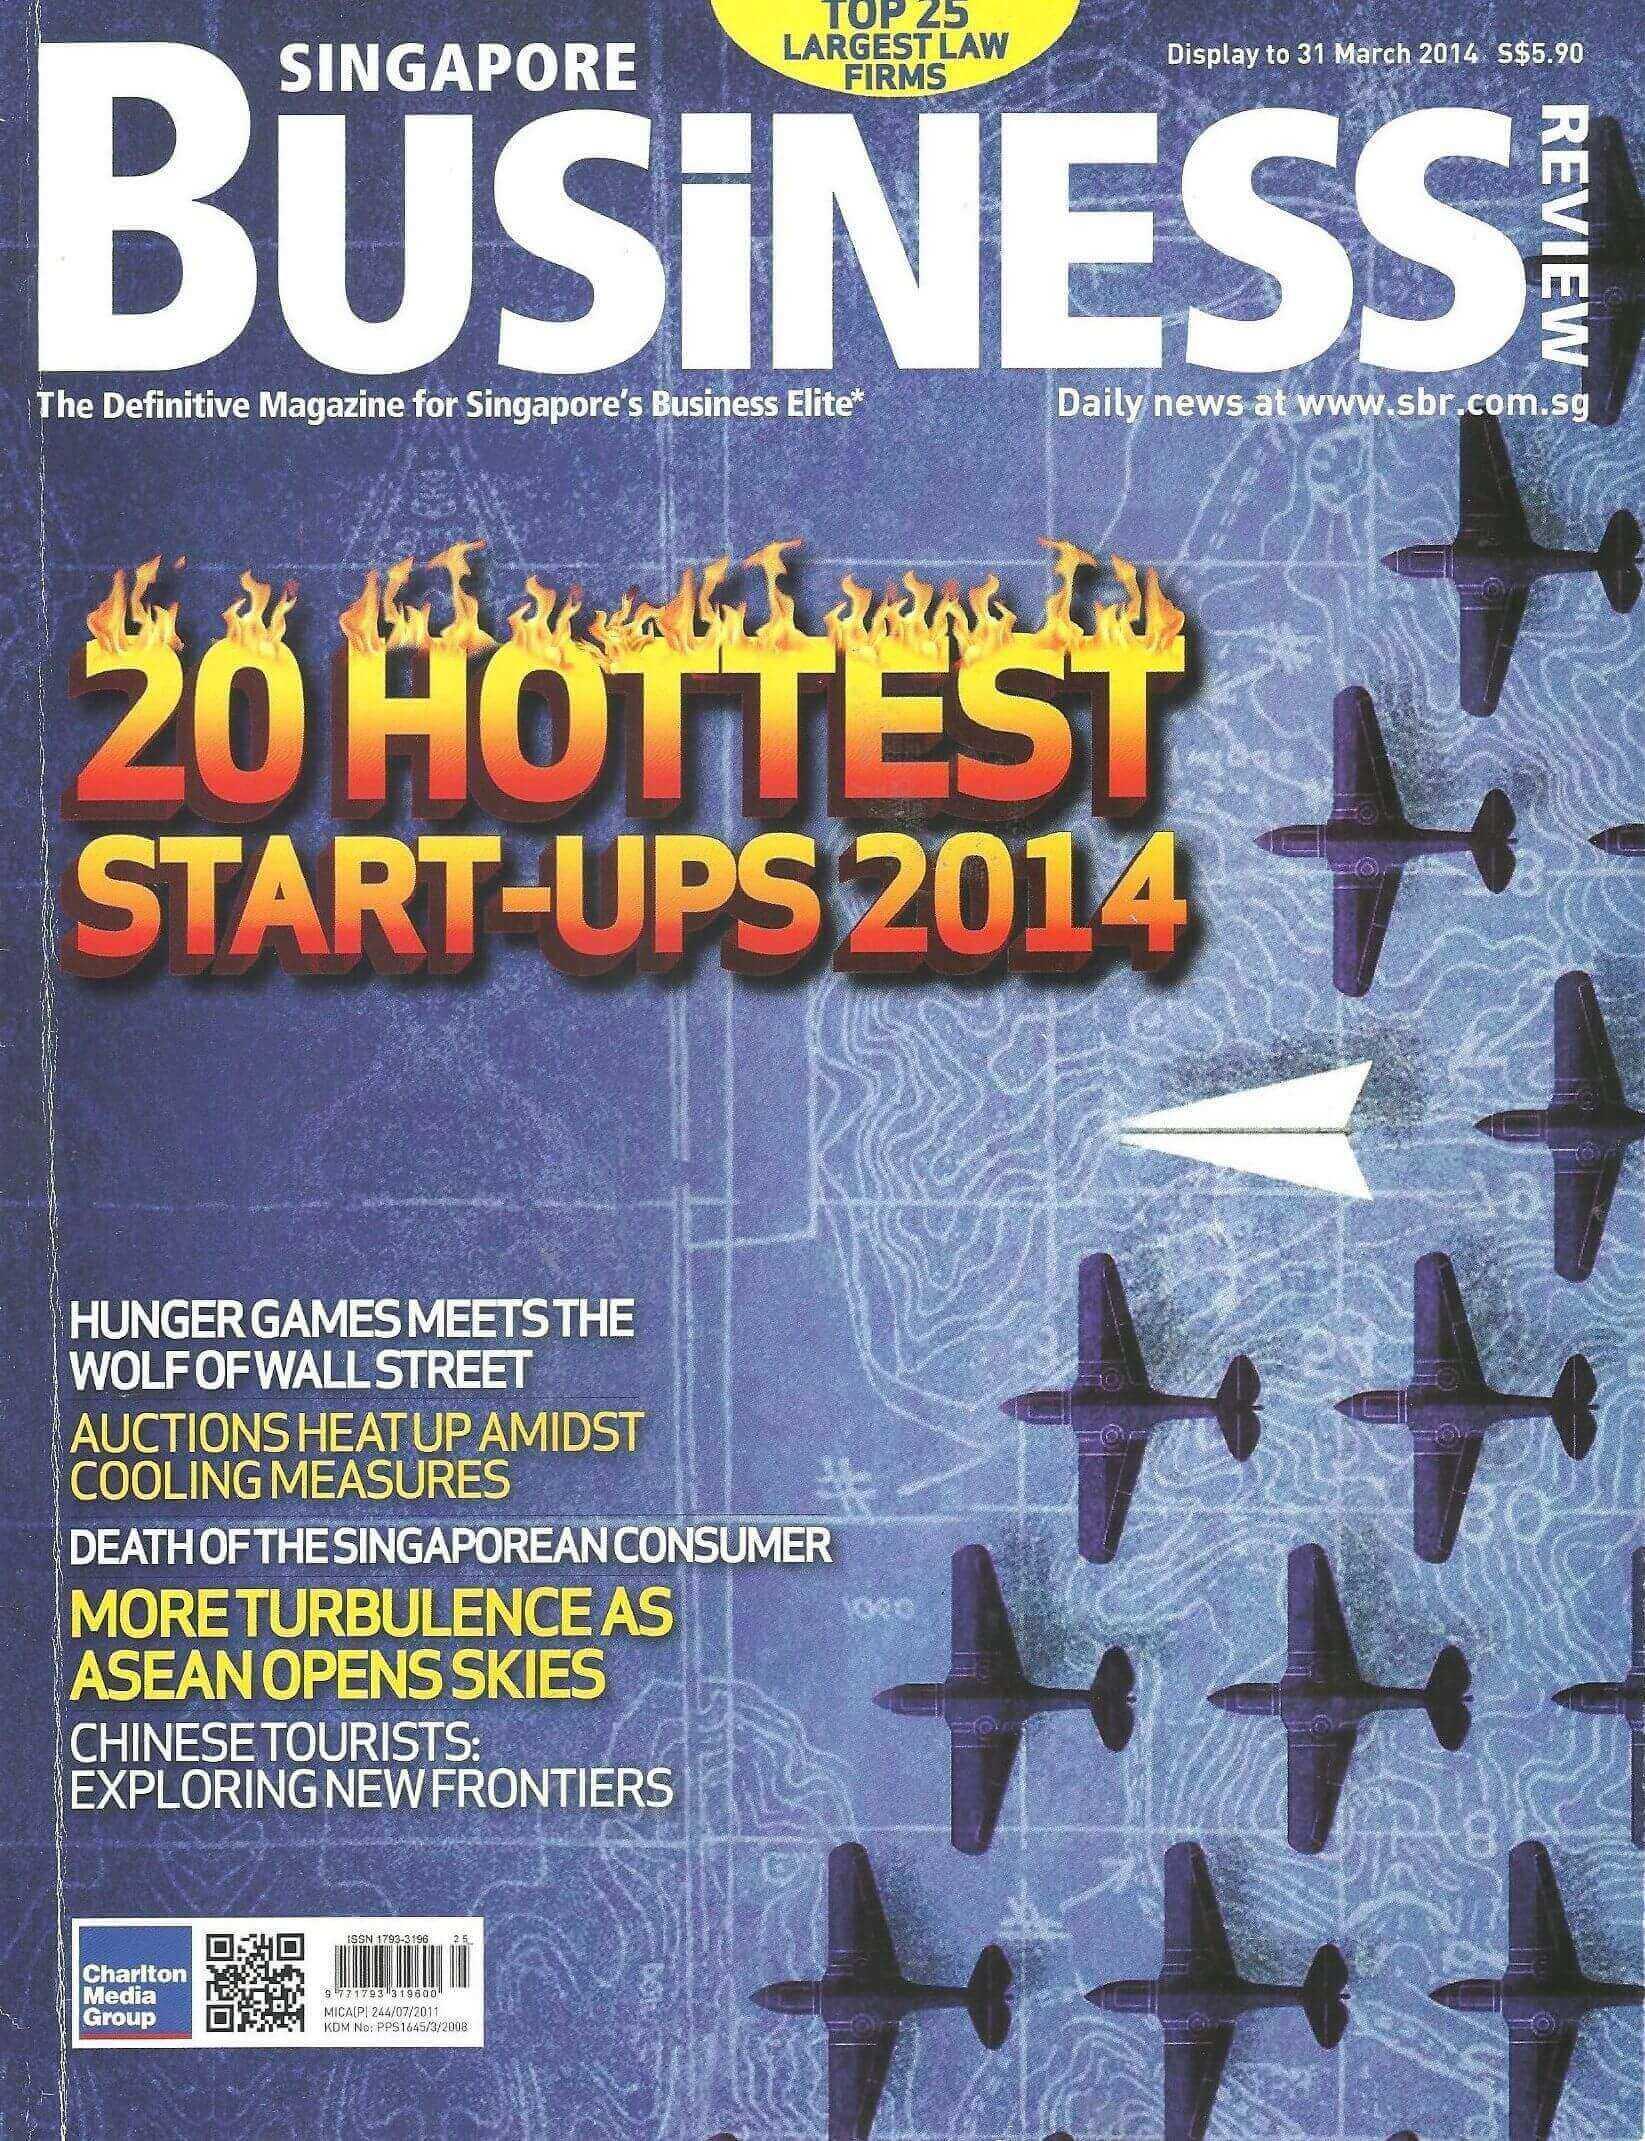 Singapore Business Review Magazine, April 2014